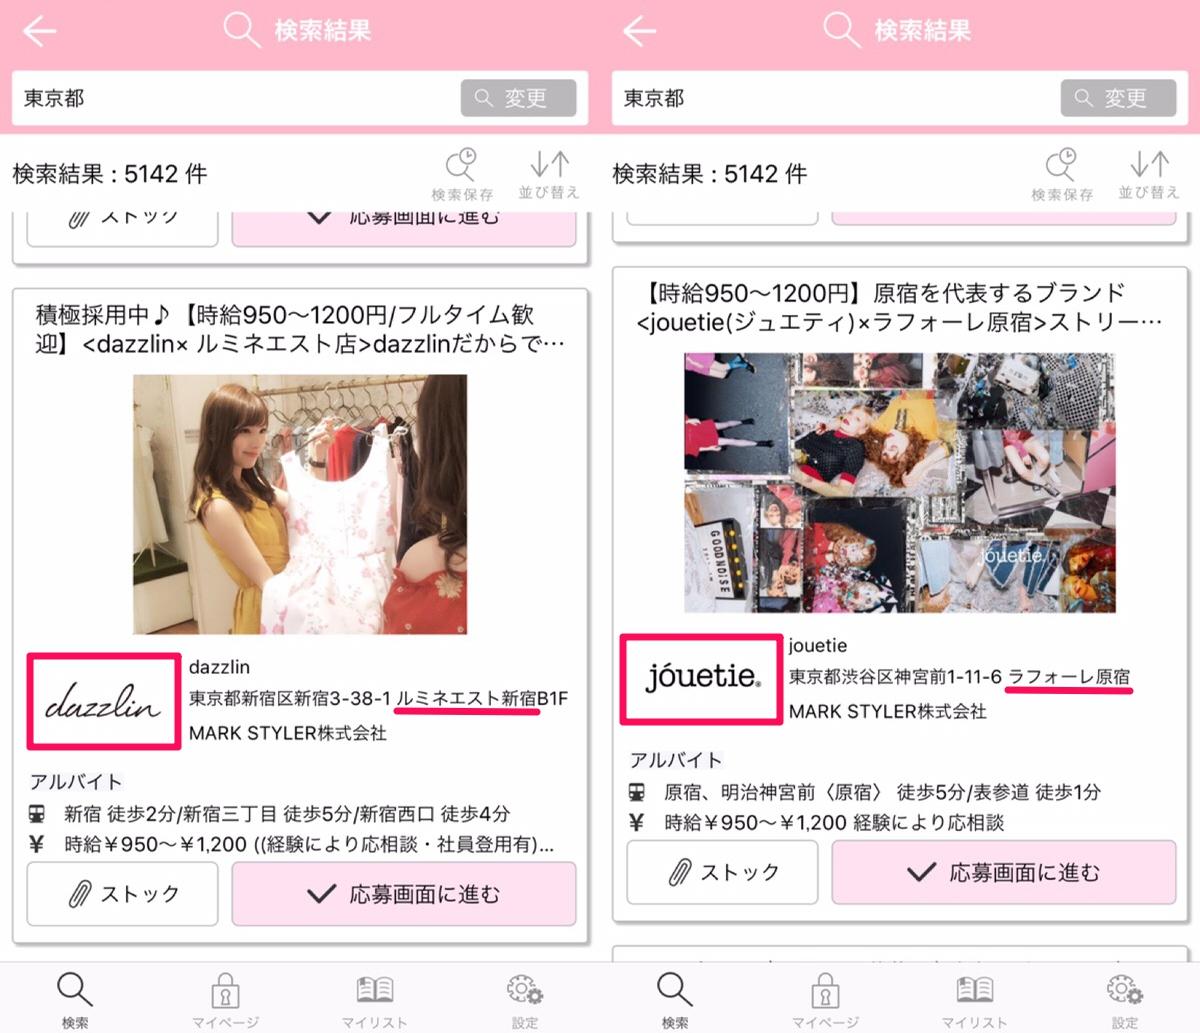 snidelやjouetieなどの有名ブランド求人が見つかるアプリ